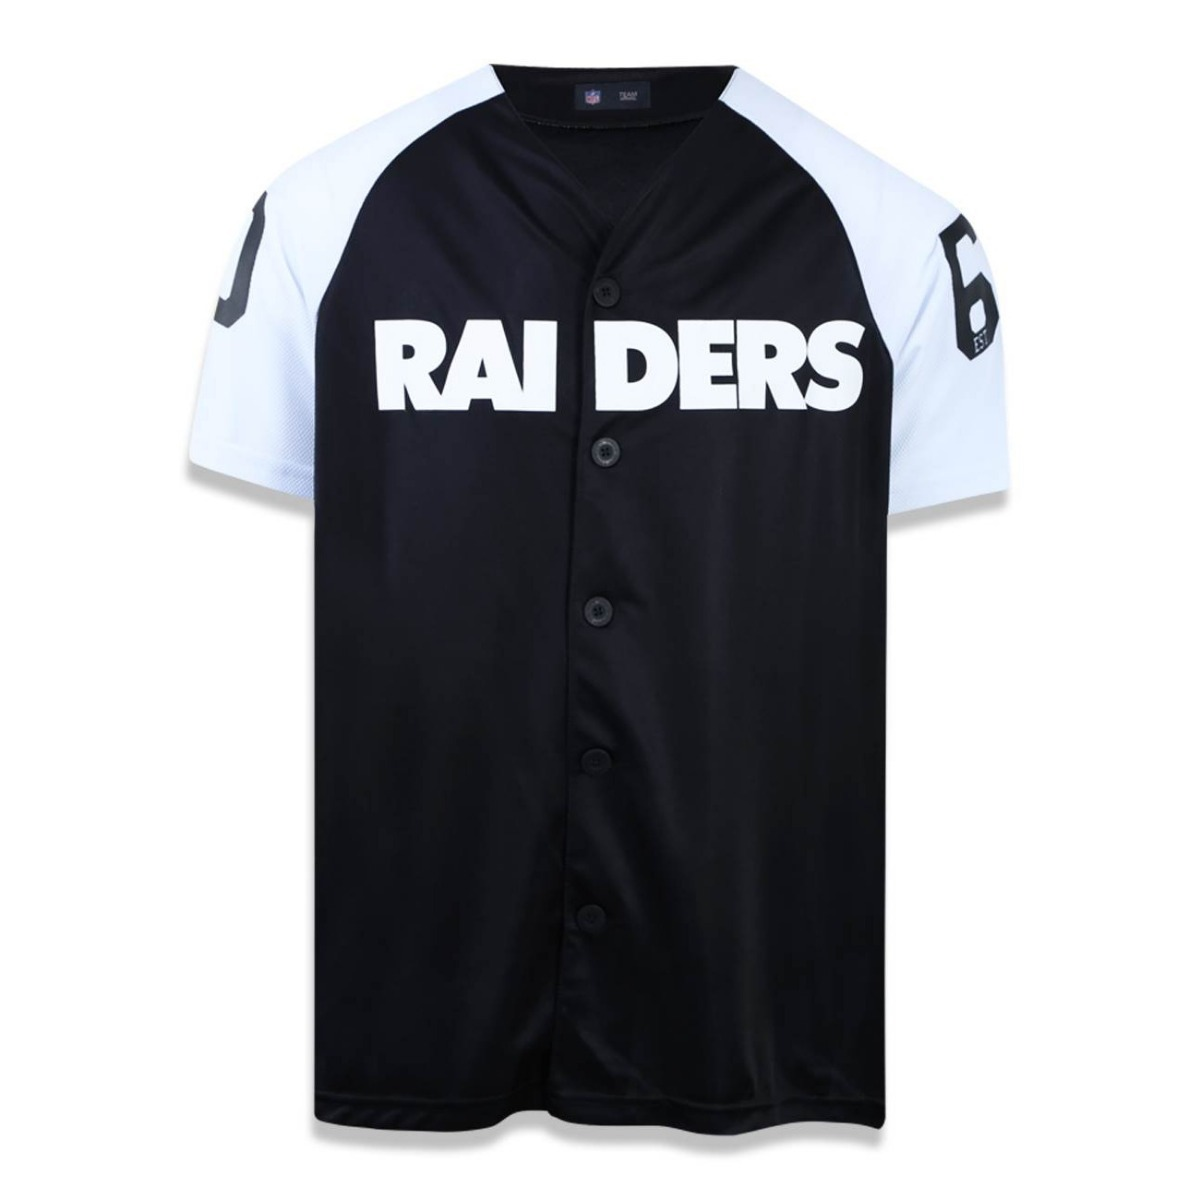 96887fd42 camisa new era oakland raiders preta original. Carregando zoom.